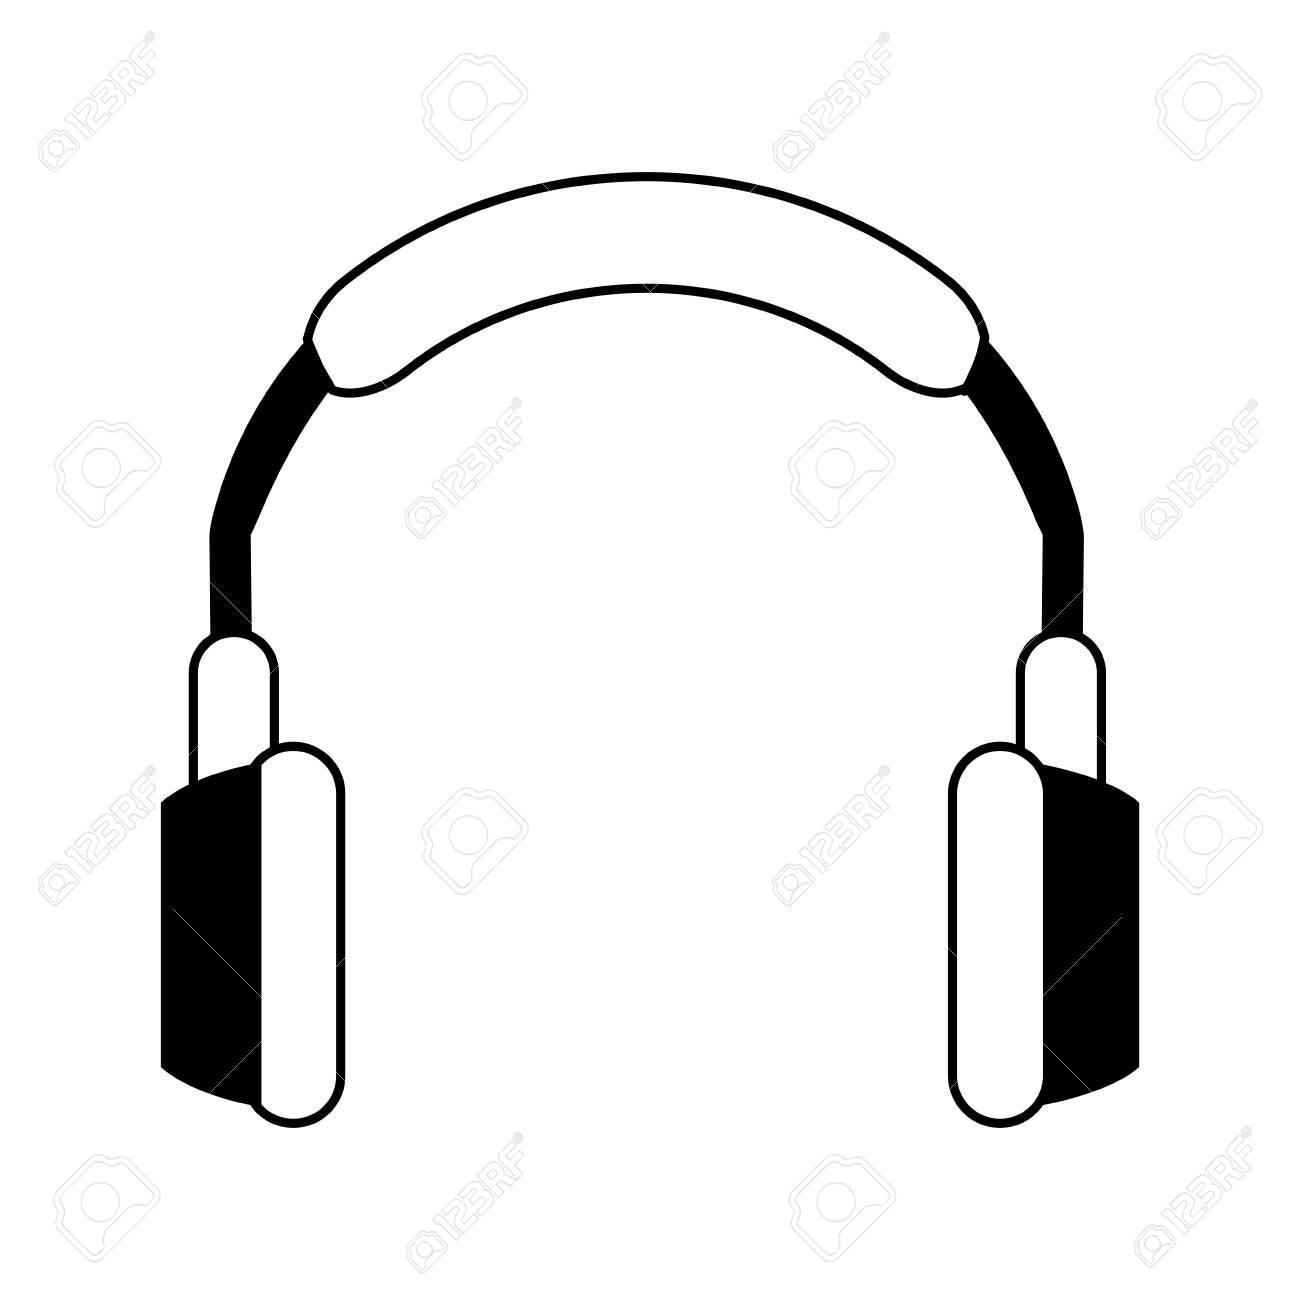 Isolierte Kopfhörer Symbol Bild Vektor Illustration Design ...